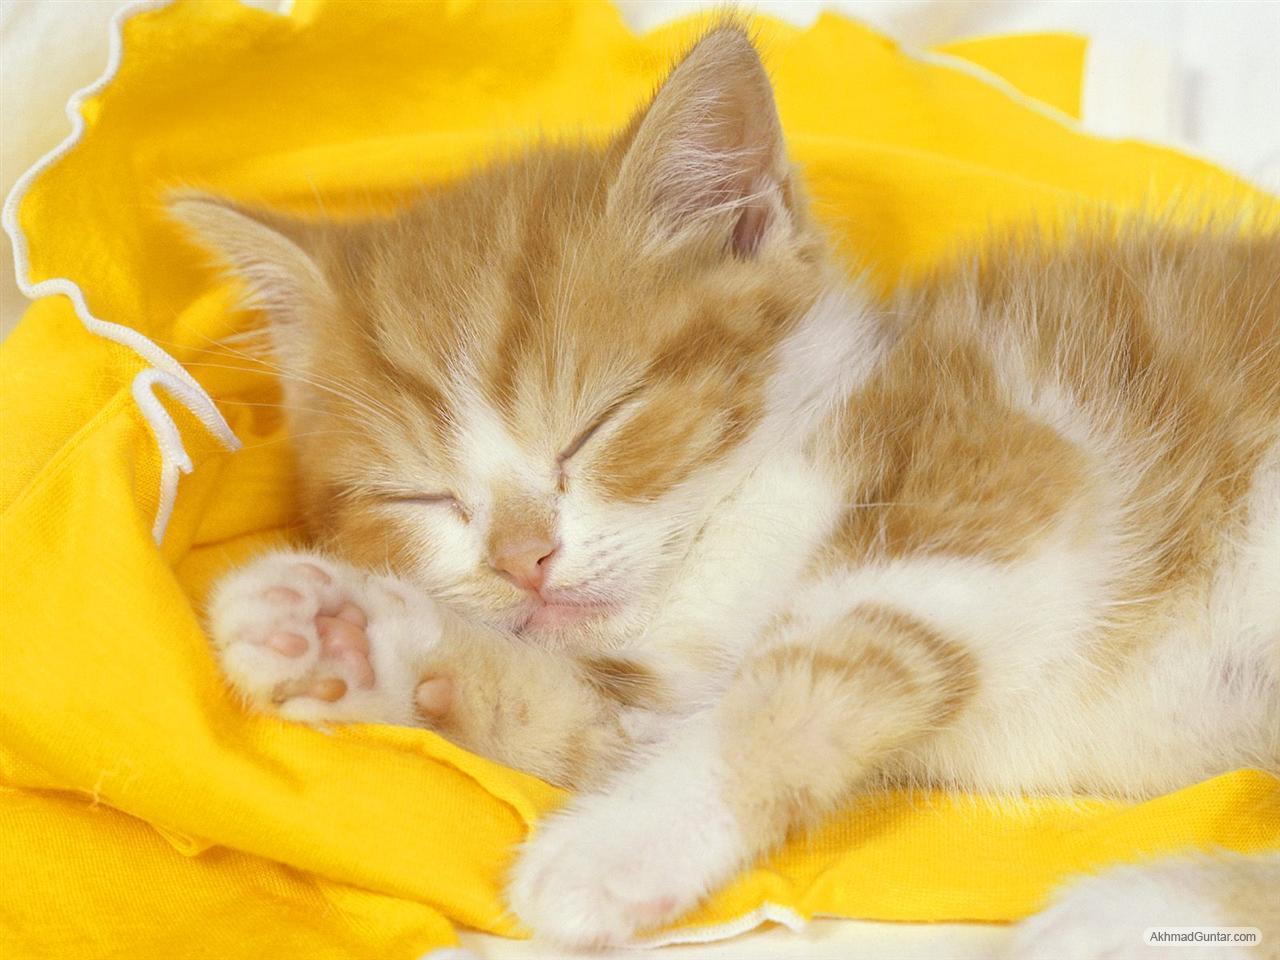 Perawatan Kucing Kucing Imut Lagi Tidur